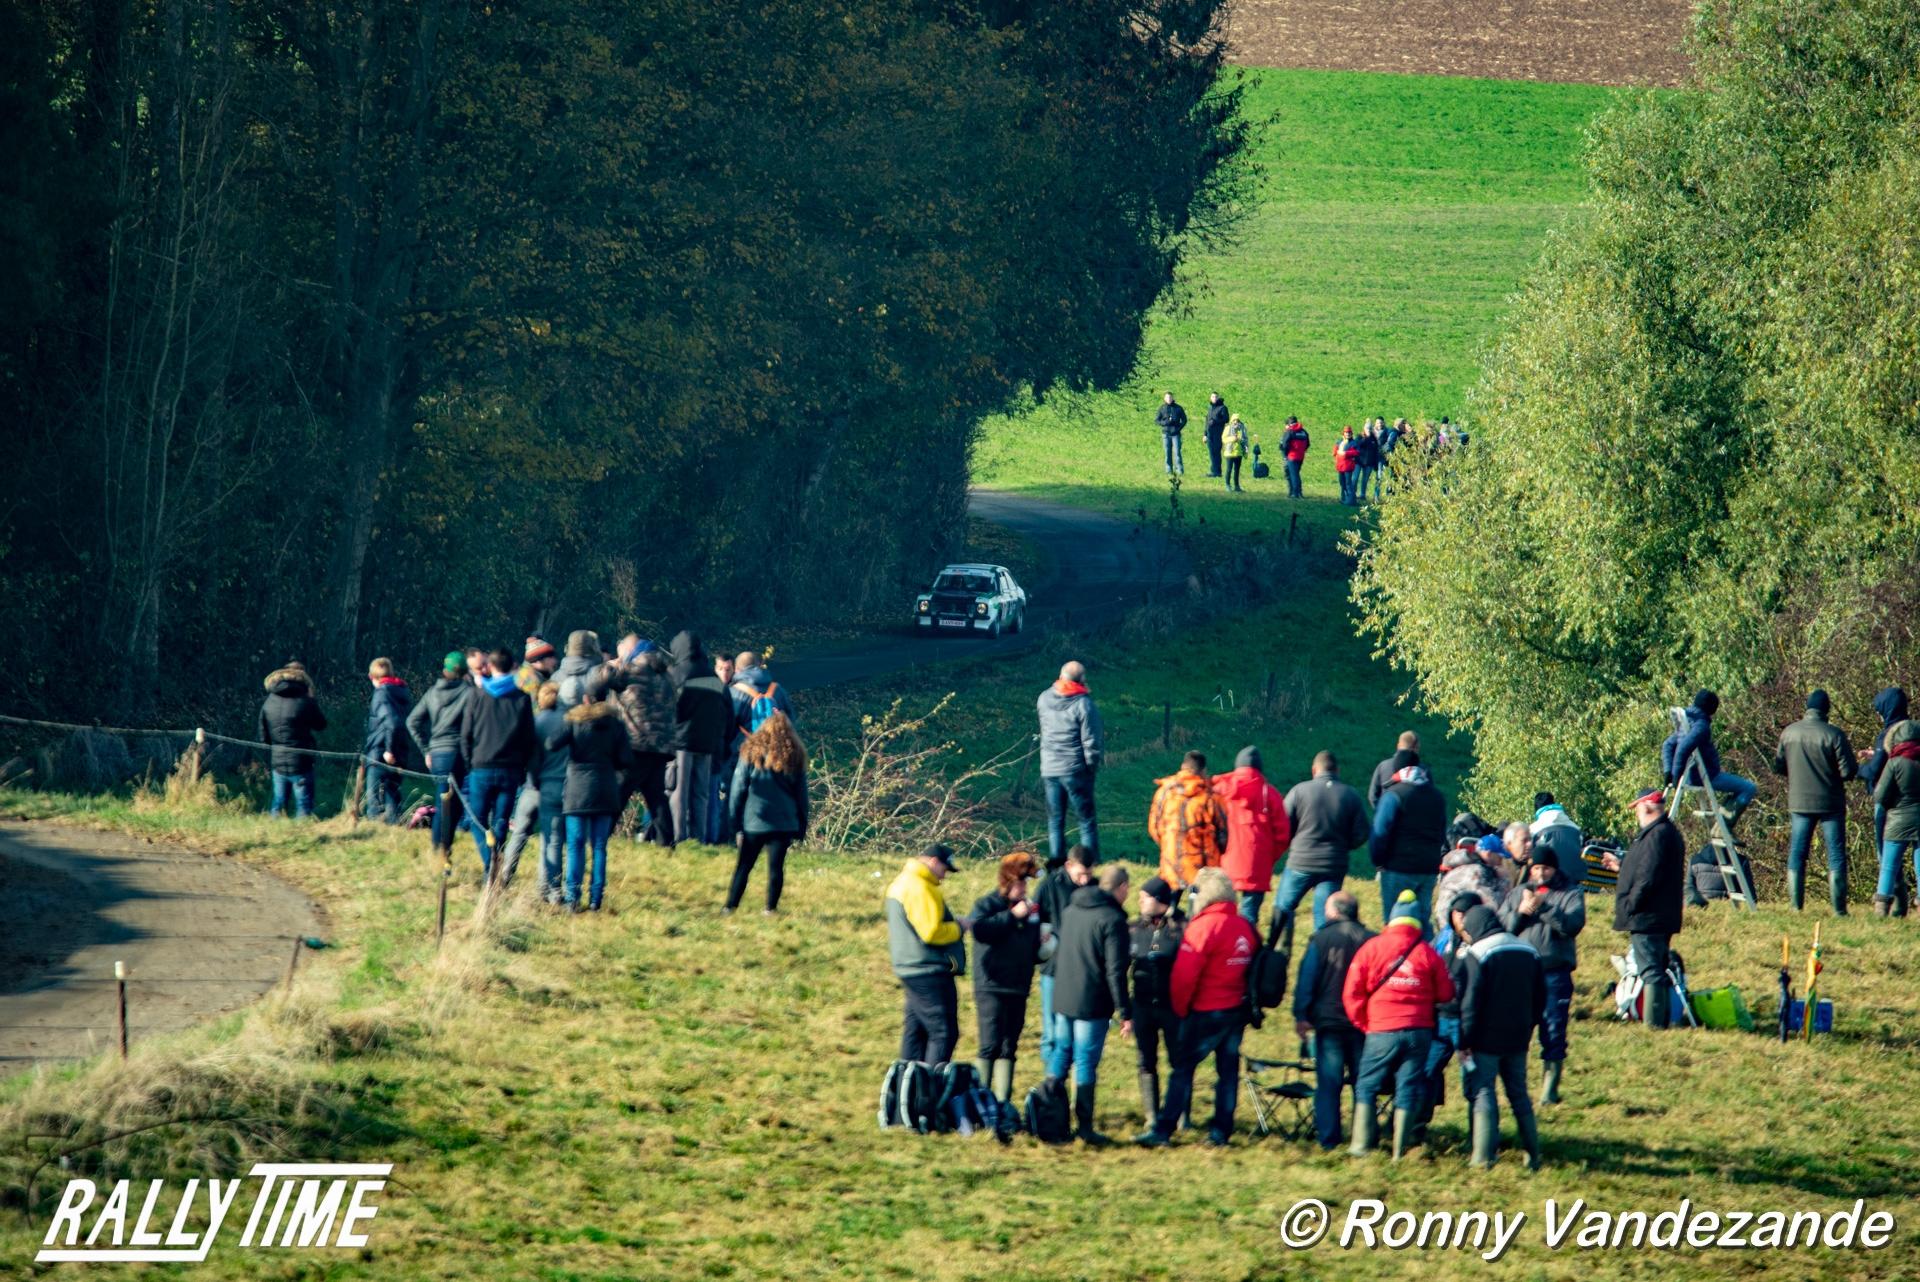 Safety Club Midden Brabant